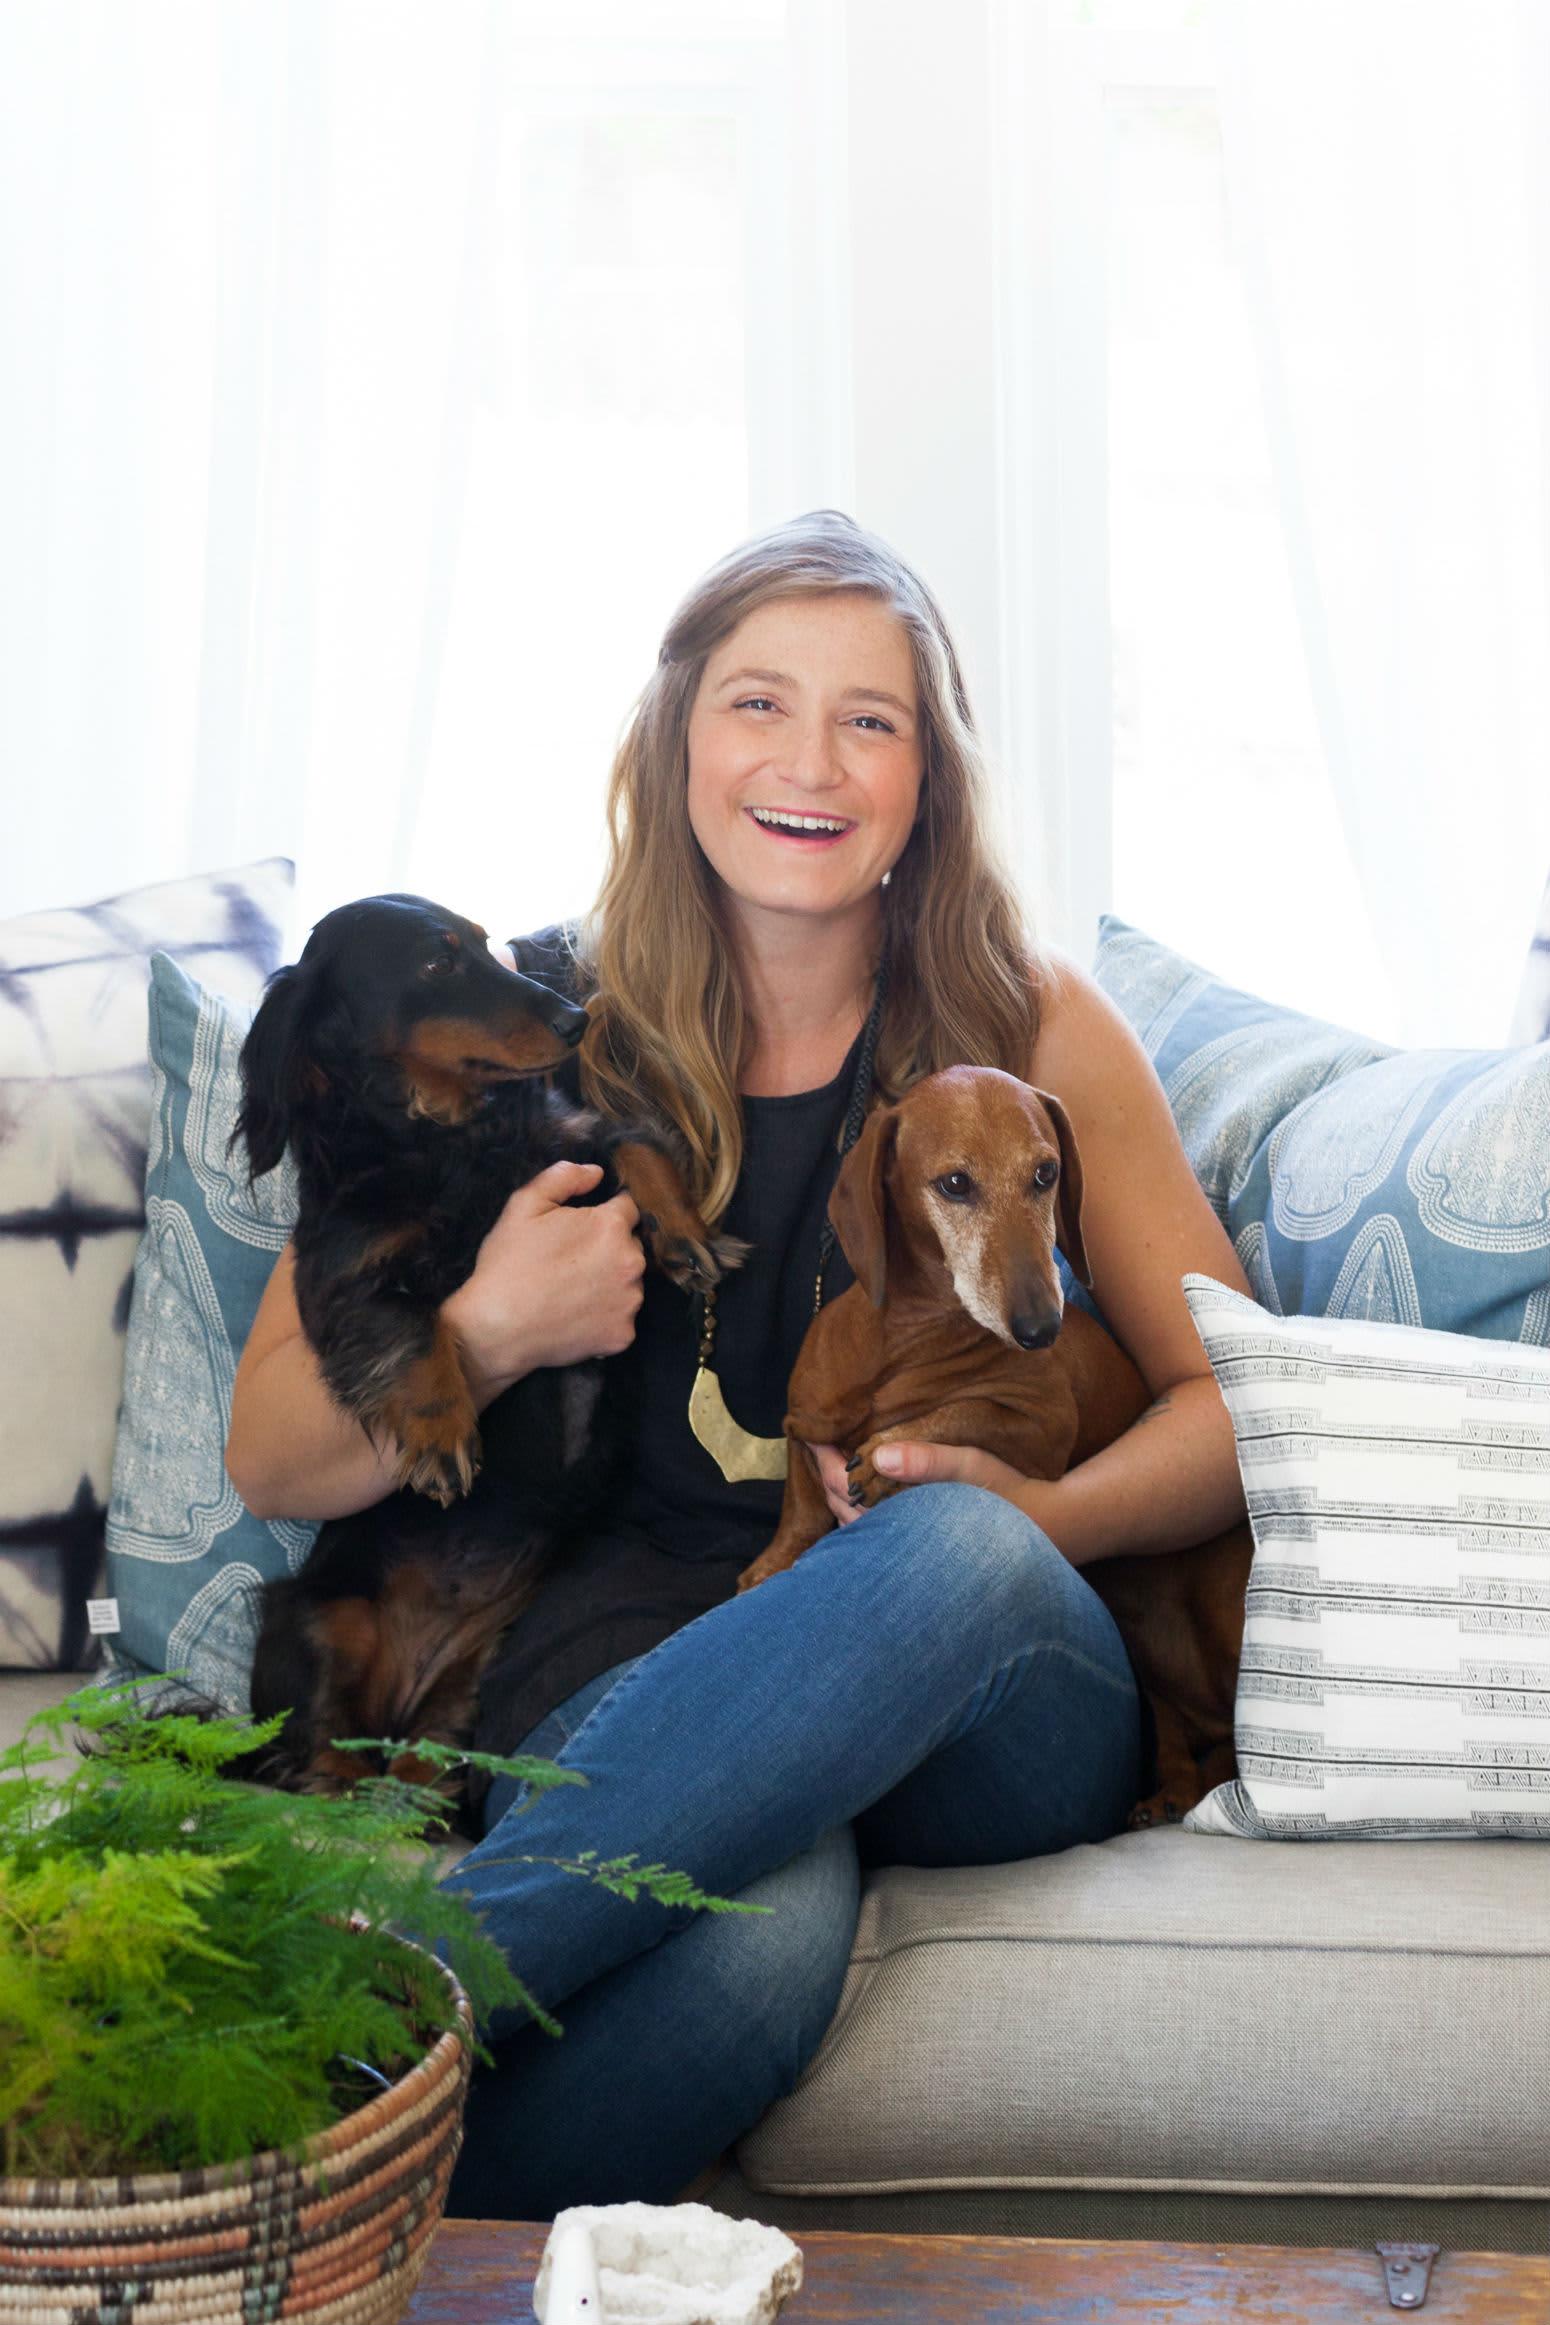 Handout Jojotastic with dogs 171117